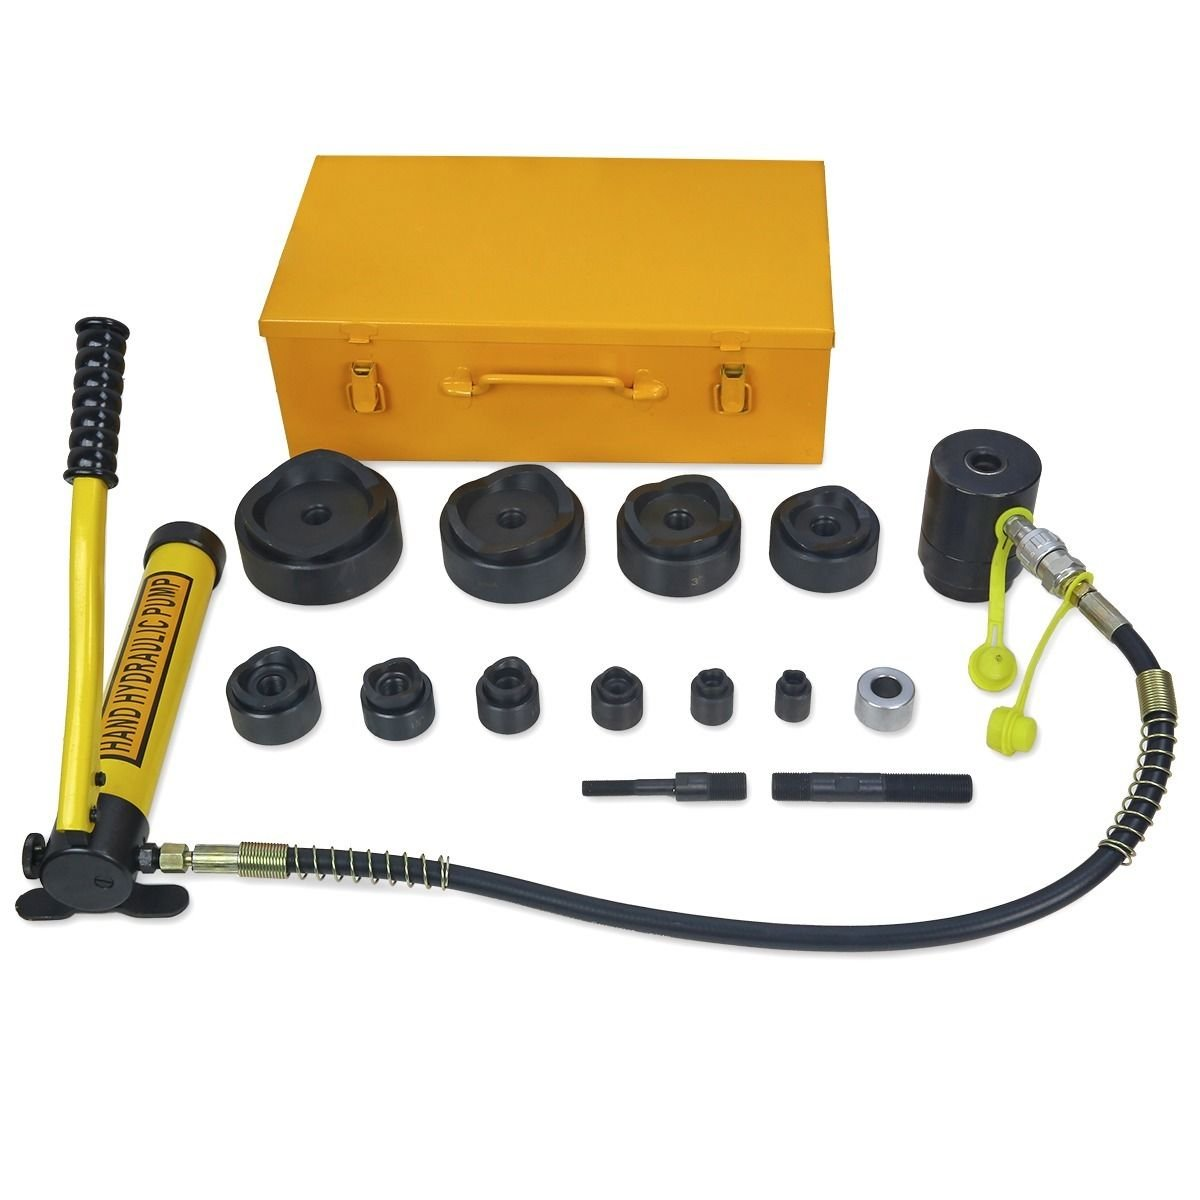 Eminentshop 15 Ton Driver Hydraulic Tool Kit w 10 Dies 1/2''-4'' Knockout Punch Set